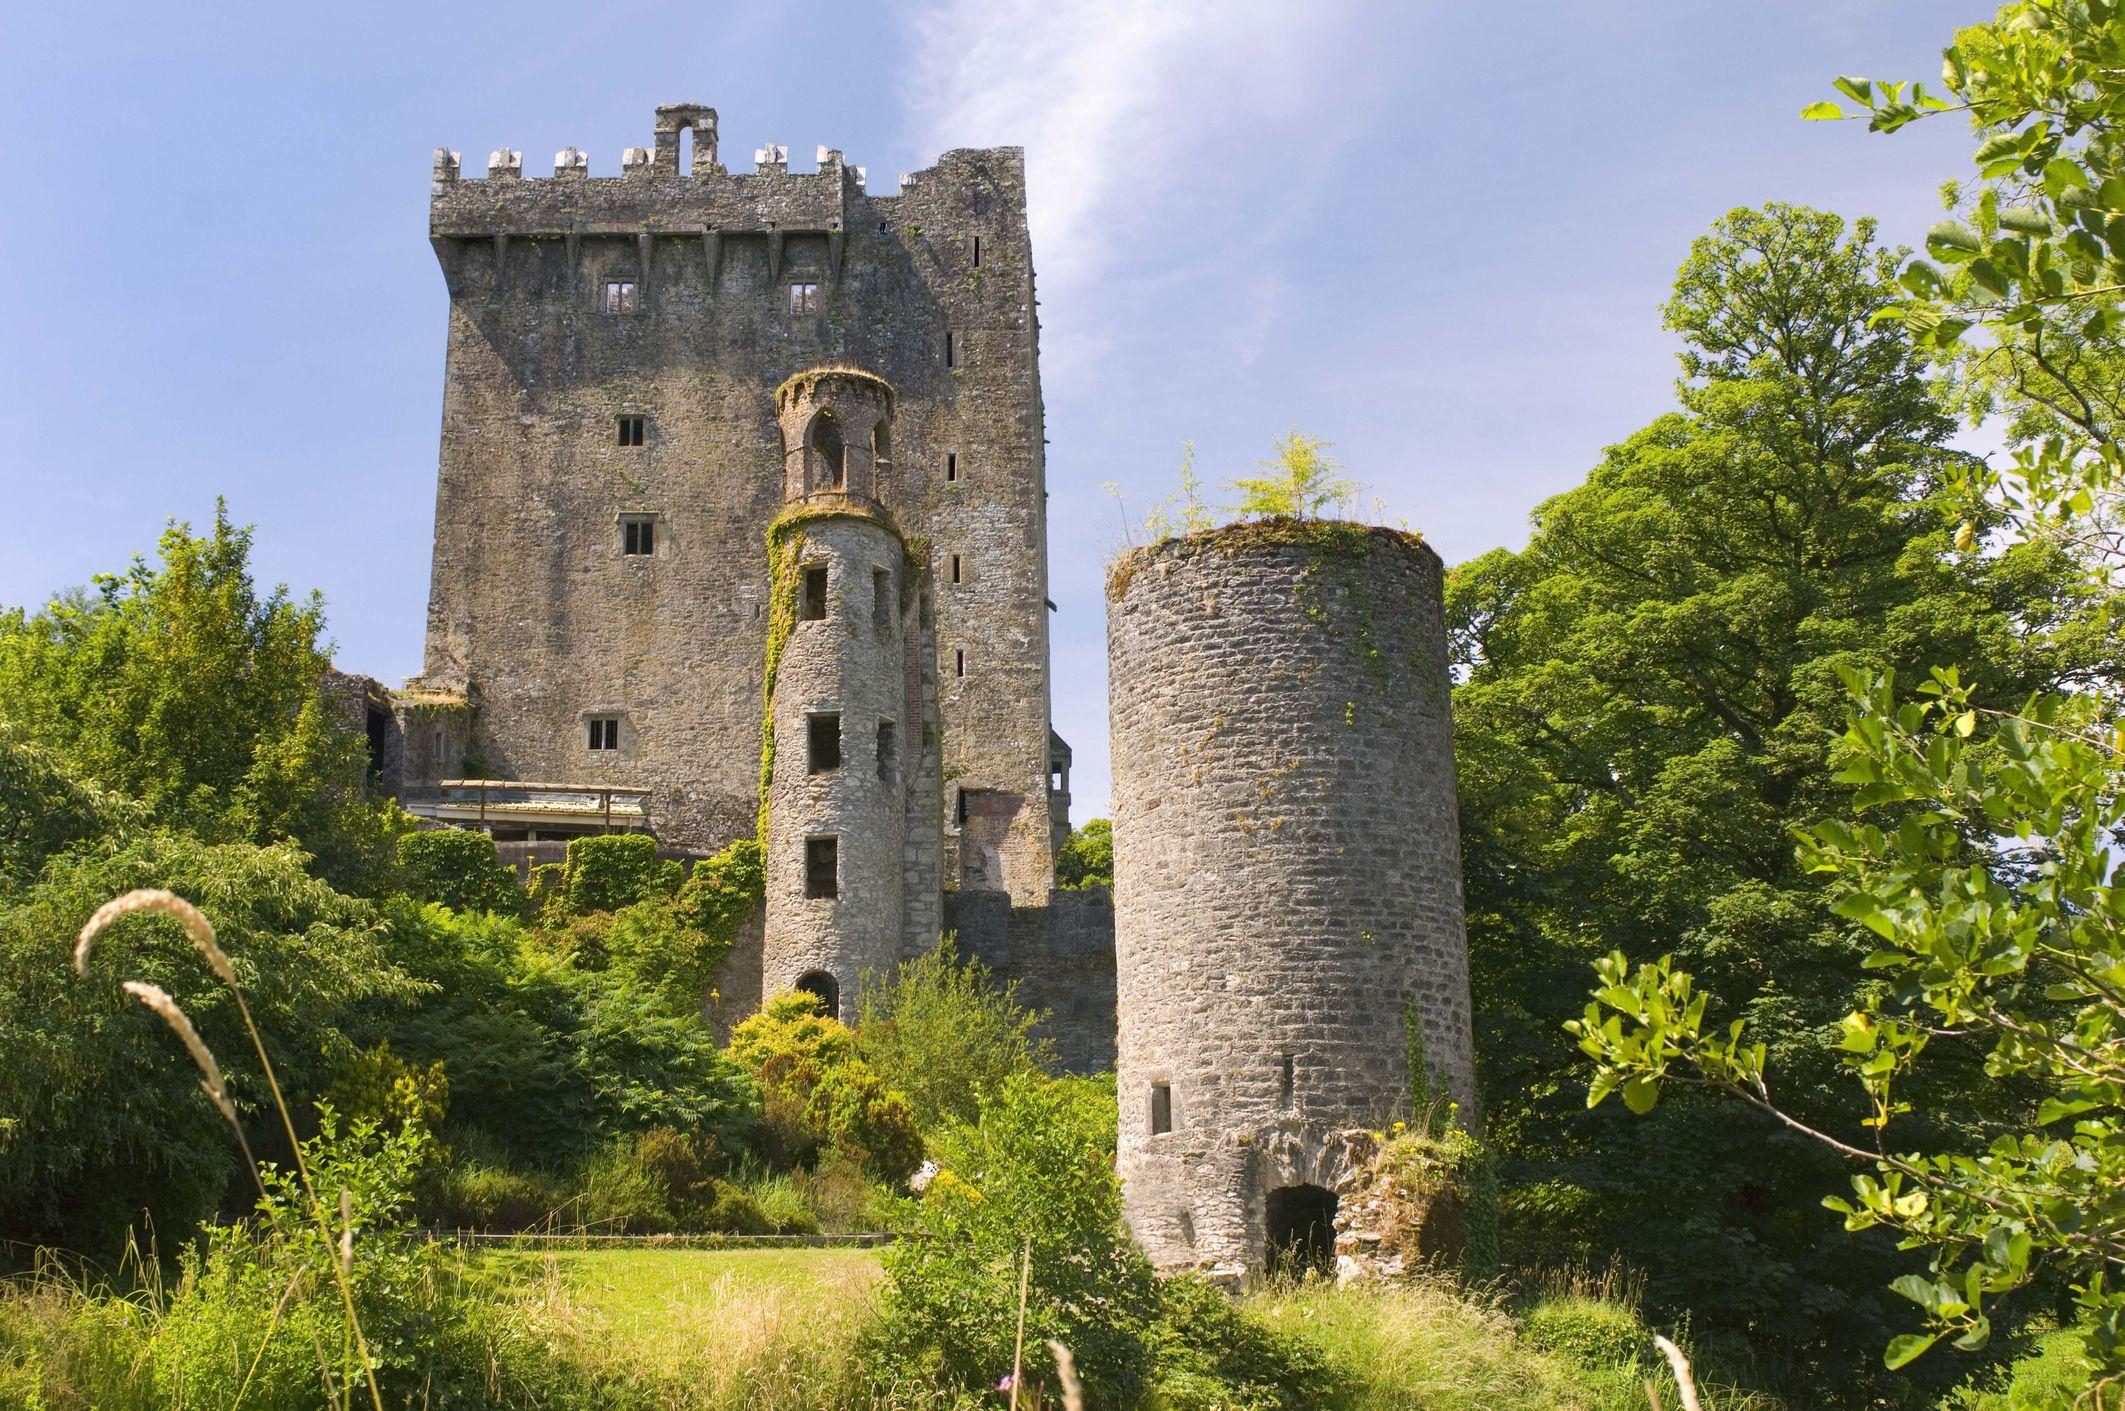 Blarney Castle, home of the Blarney Stone